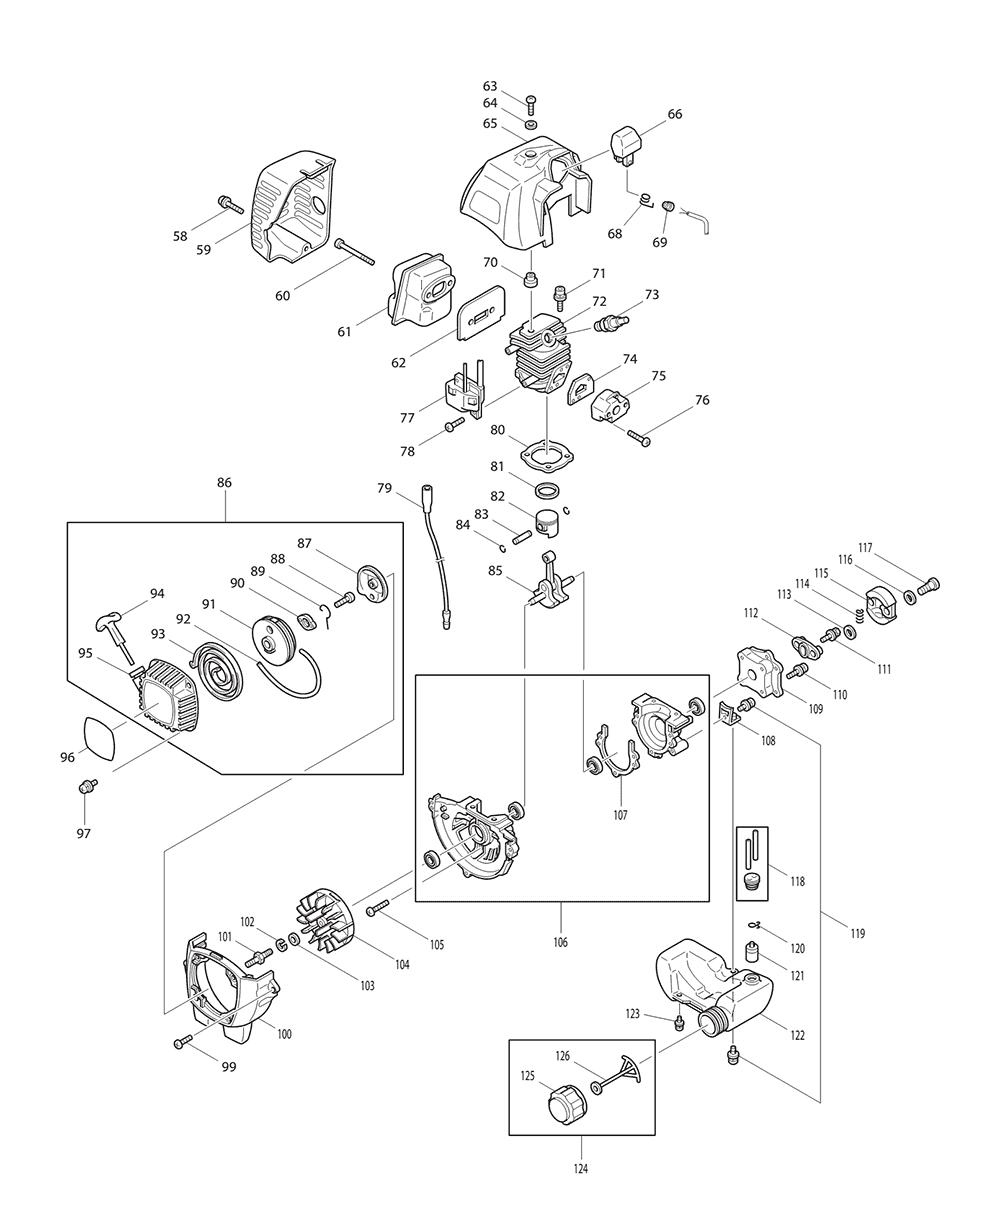 HTR5600-T2-Makita-PB-1Break Down